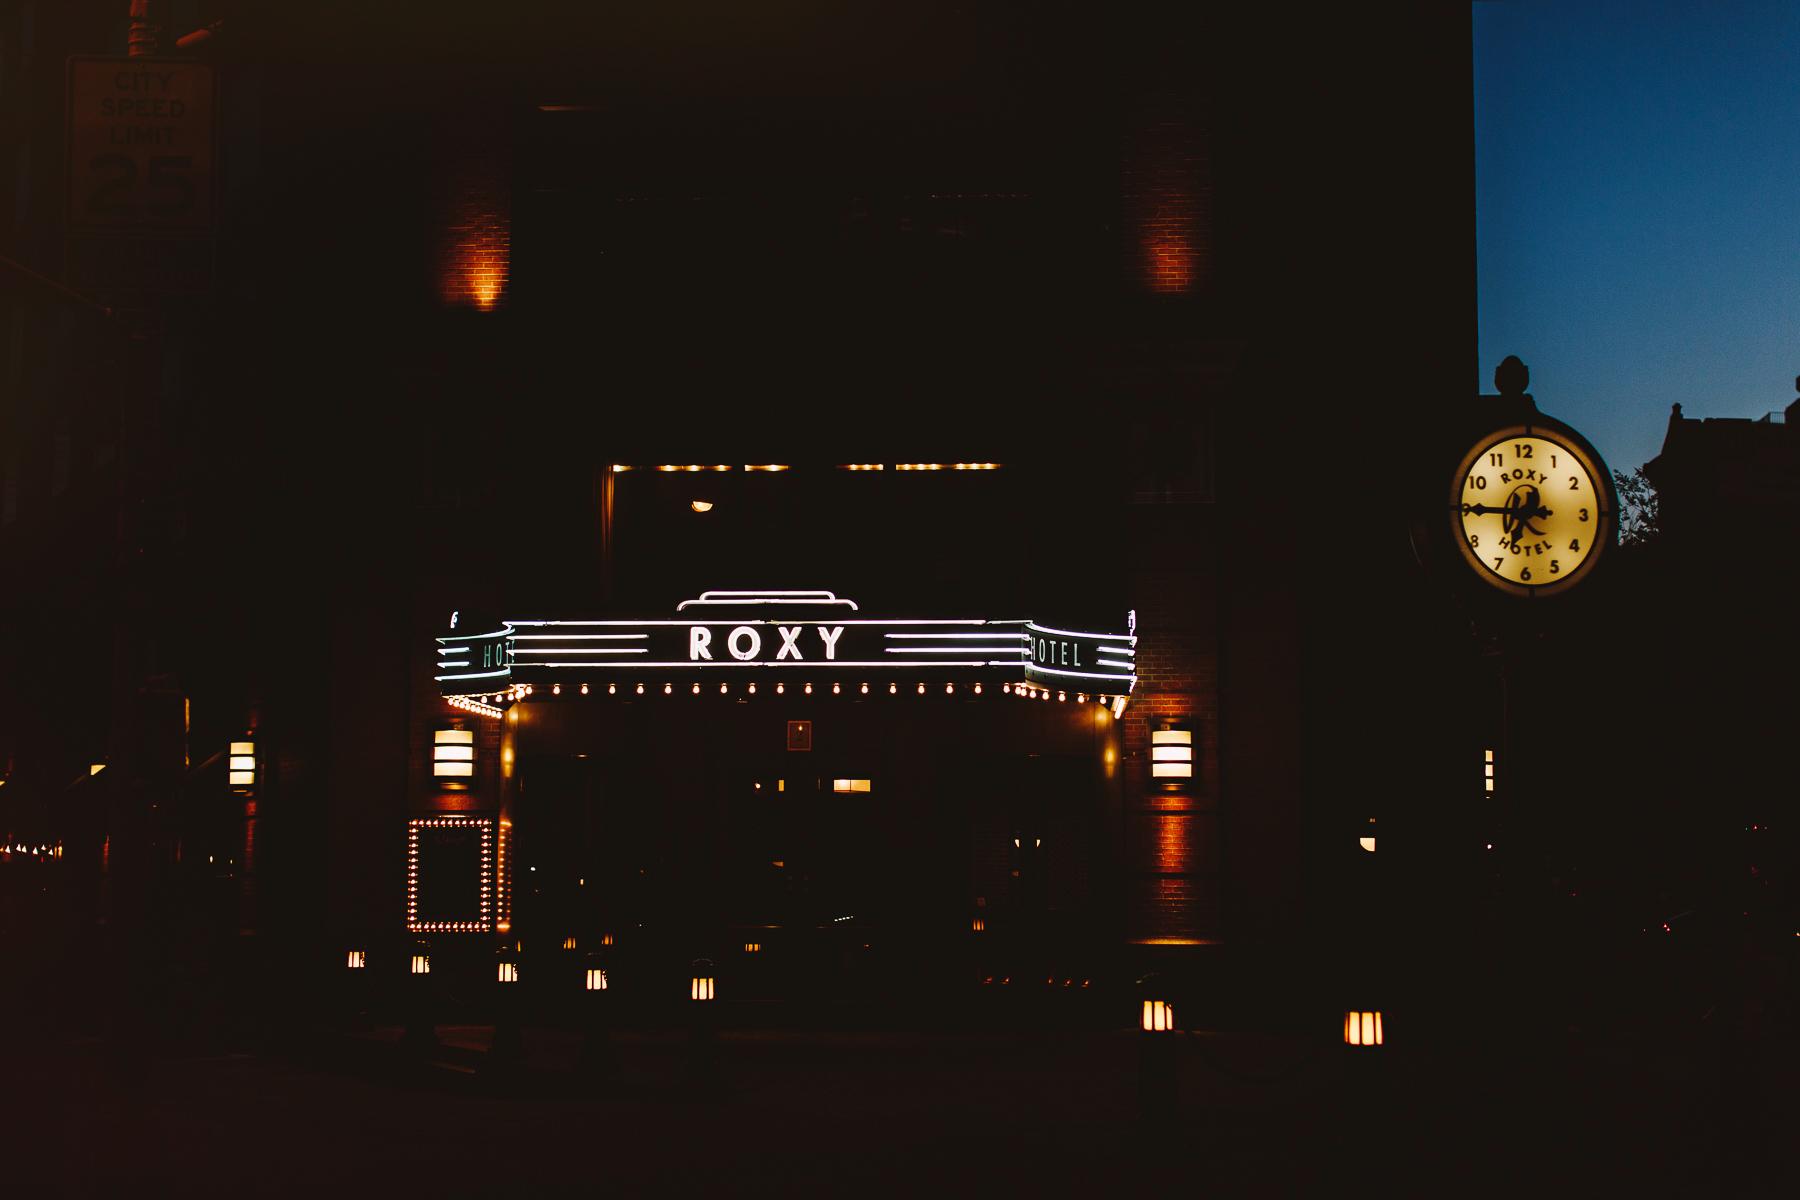 Roxy Hotel NYC